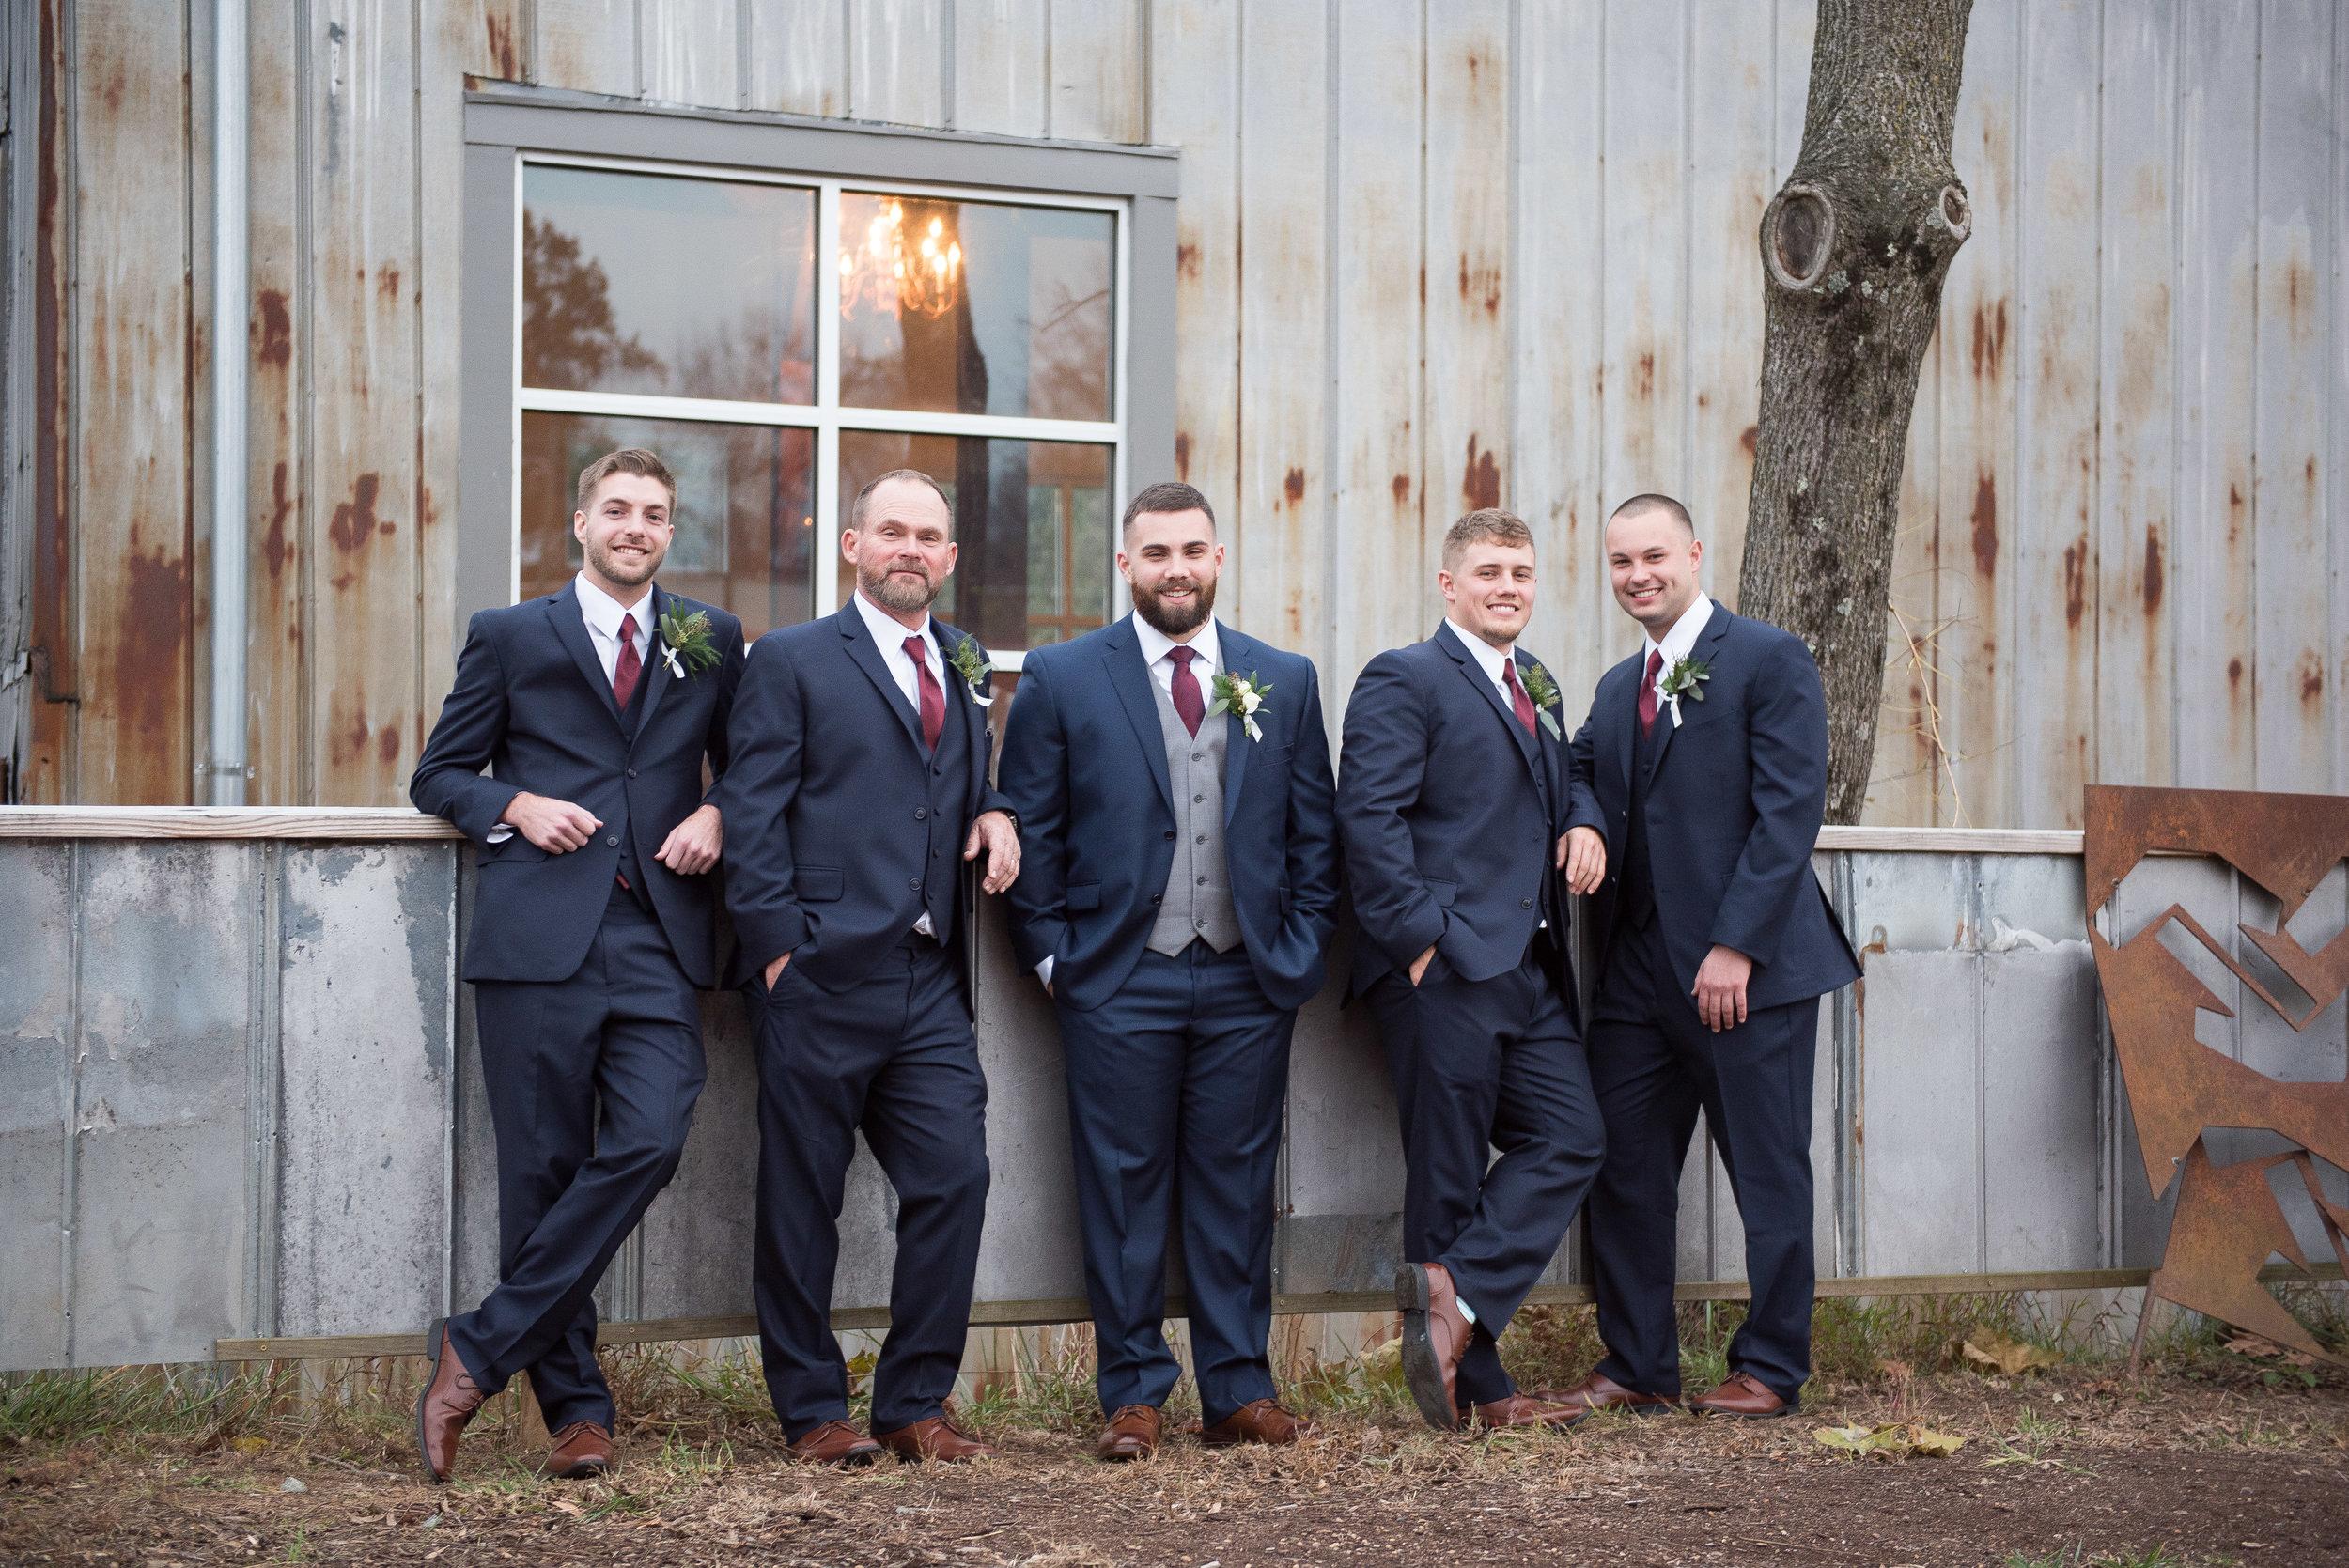 The Roller Mill Events - Winston Salem Weddings - NC Weddings - High Point NC Weddings - Winston Salem Venue - Yasmin Leonard Photography-59.jpg